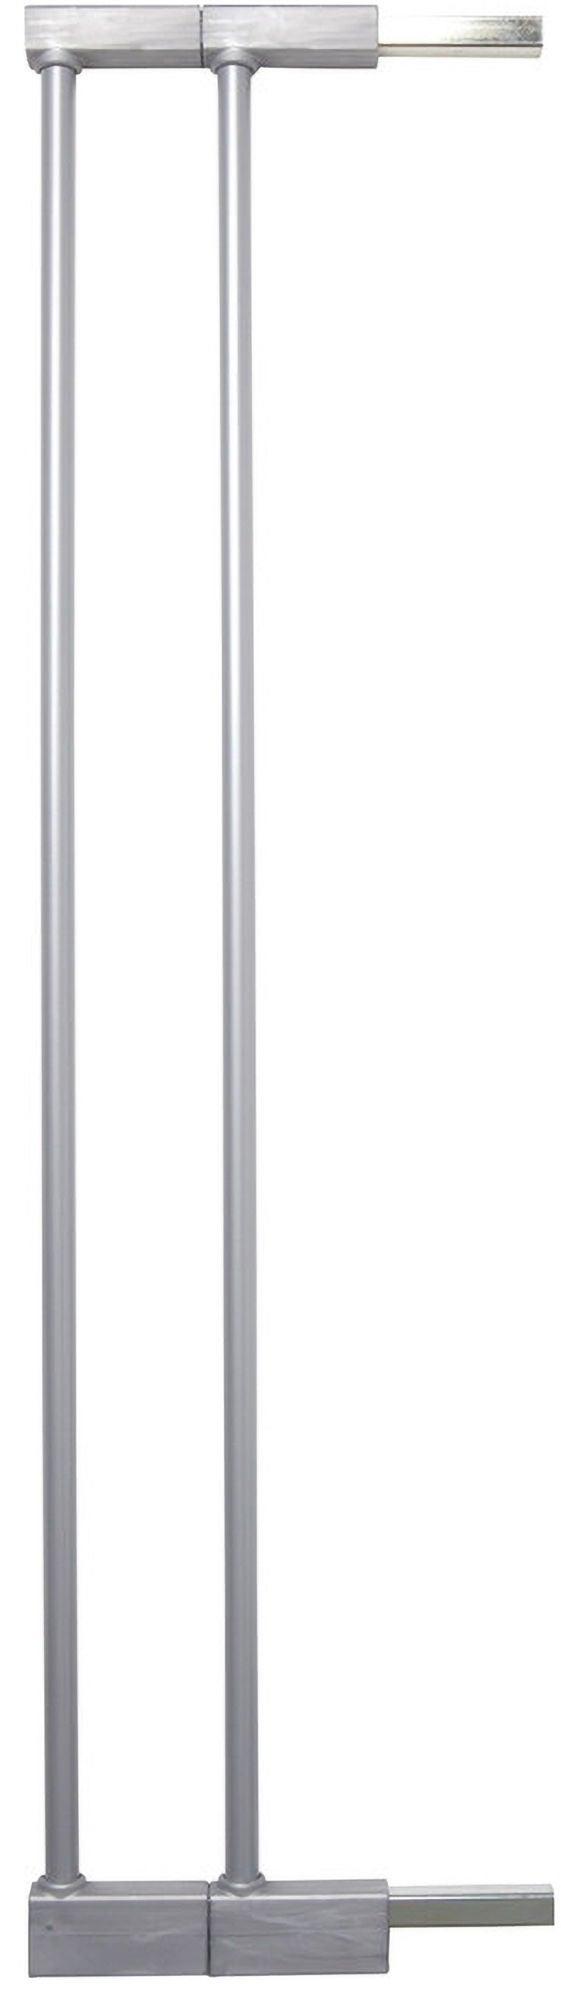 BabyDan Extend-A-Gate Turvaportin Jatkopalat 2 x 7cm, Hopea